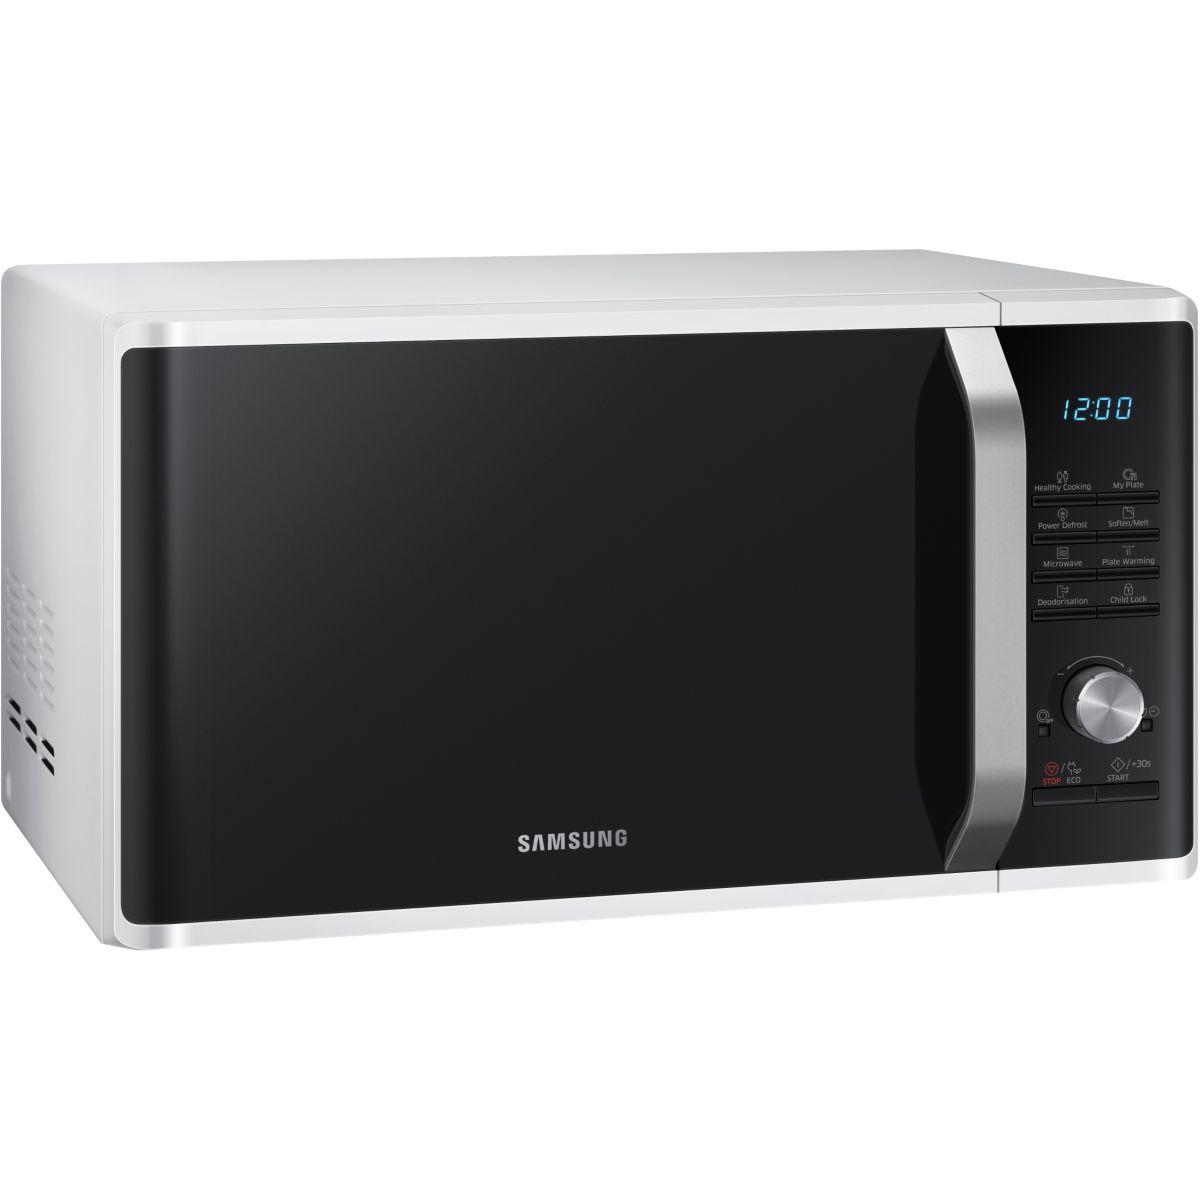 Micro ondes SAMSUNG MS28J5215AW